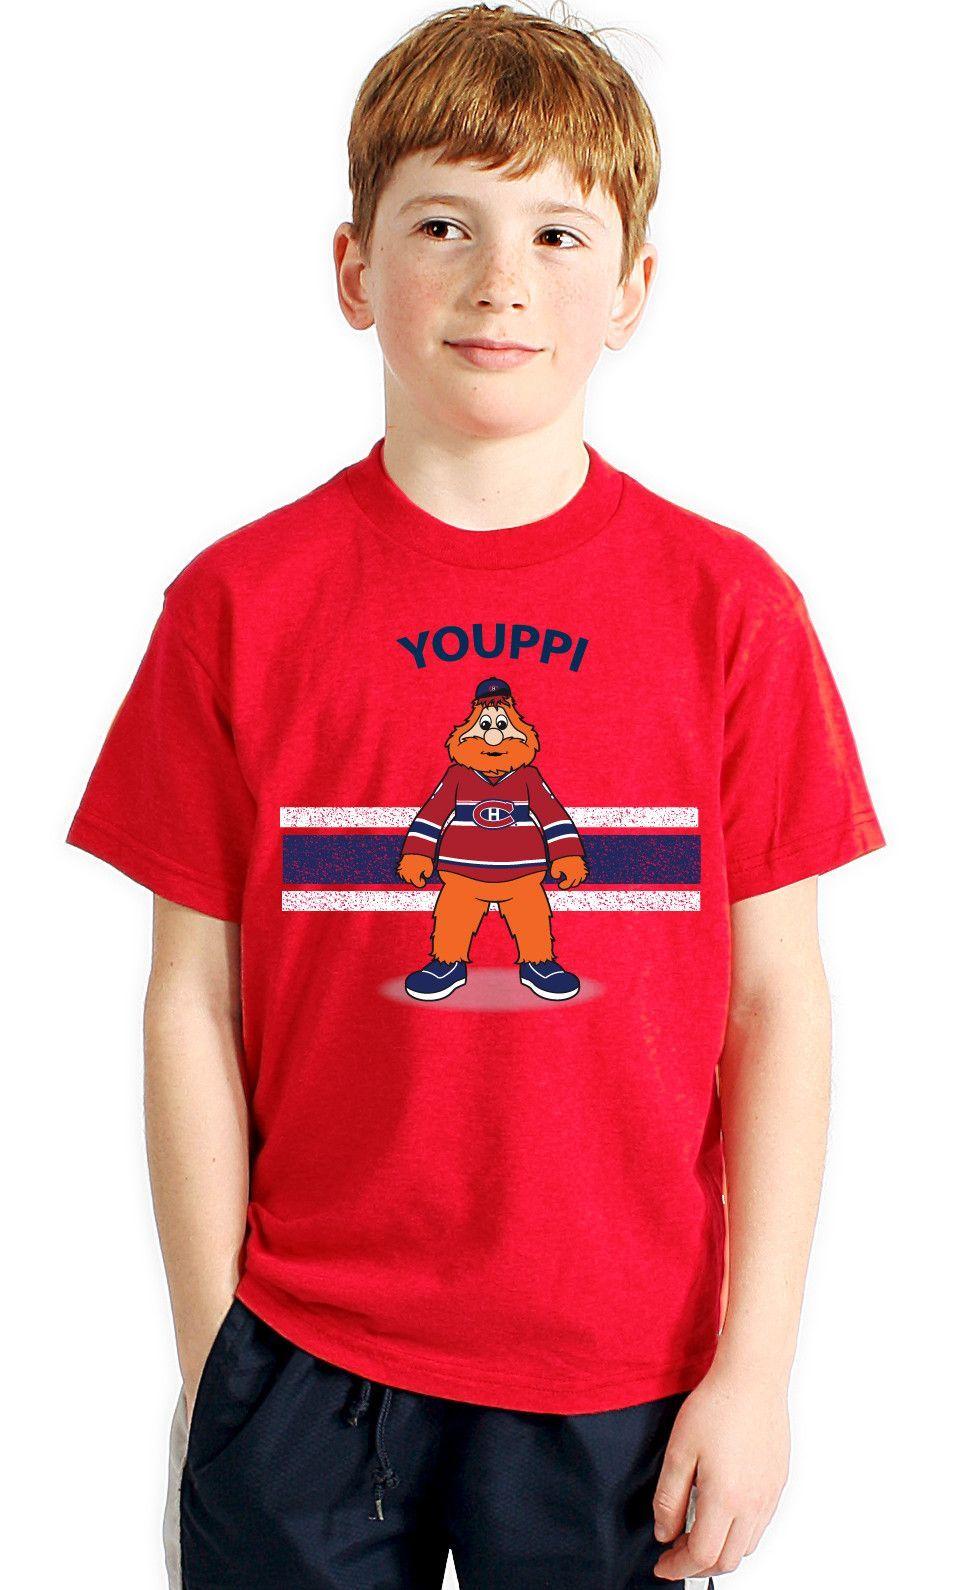 Youppi Montreal Canadiens Toddler Mascot T-Shirt  16fba3242